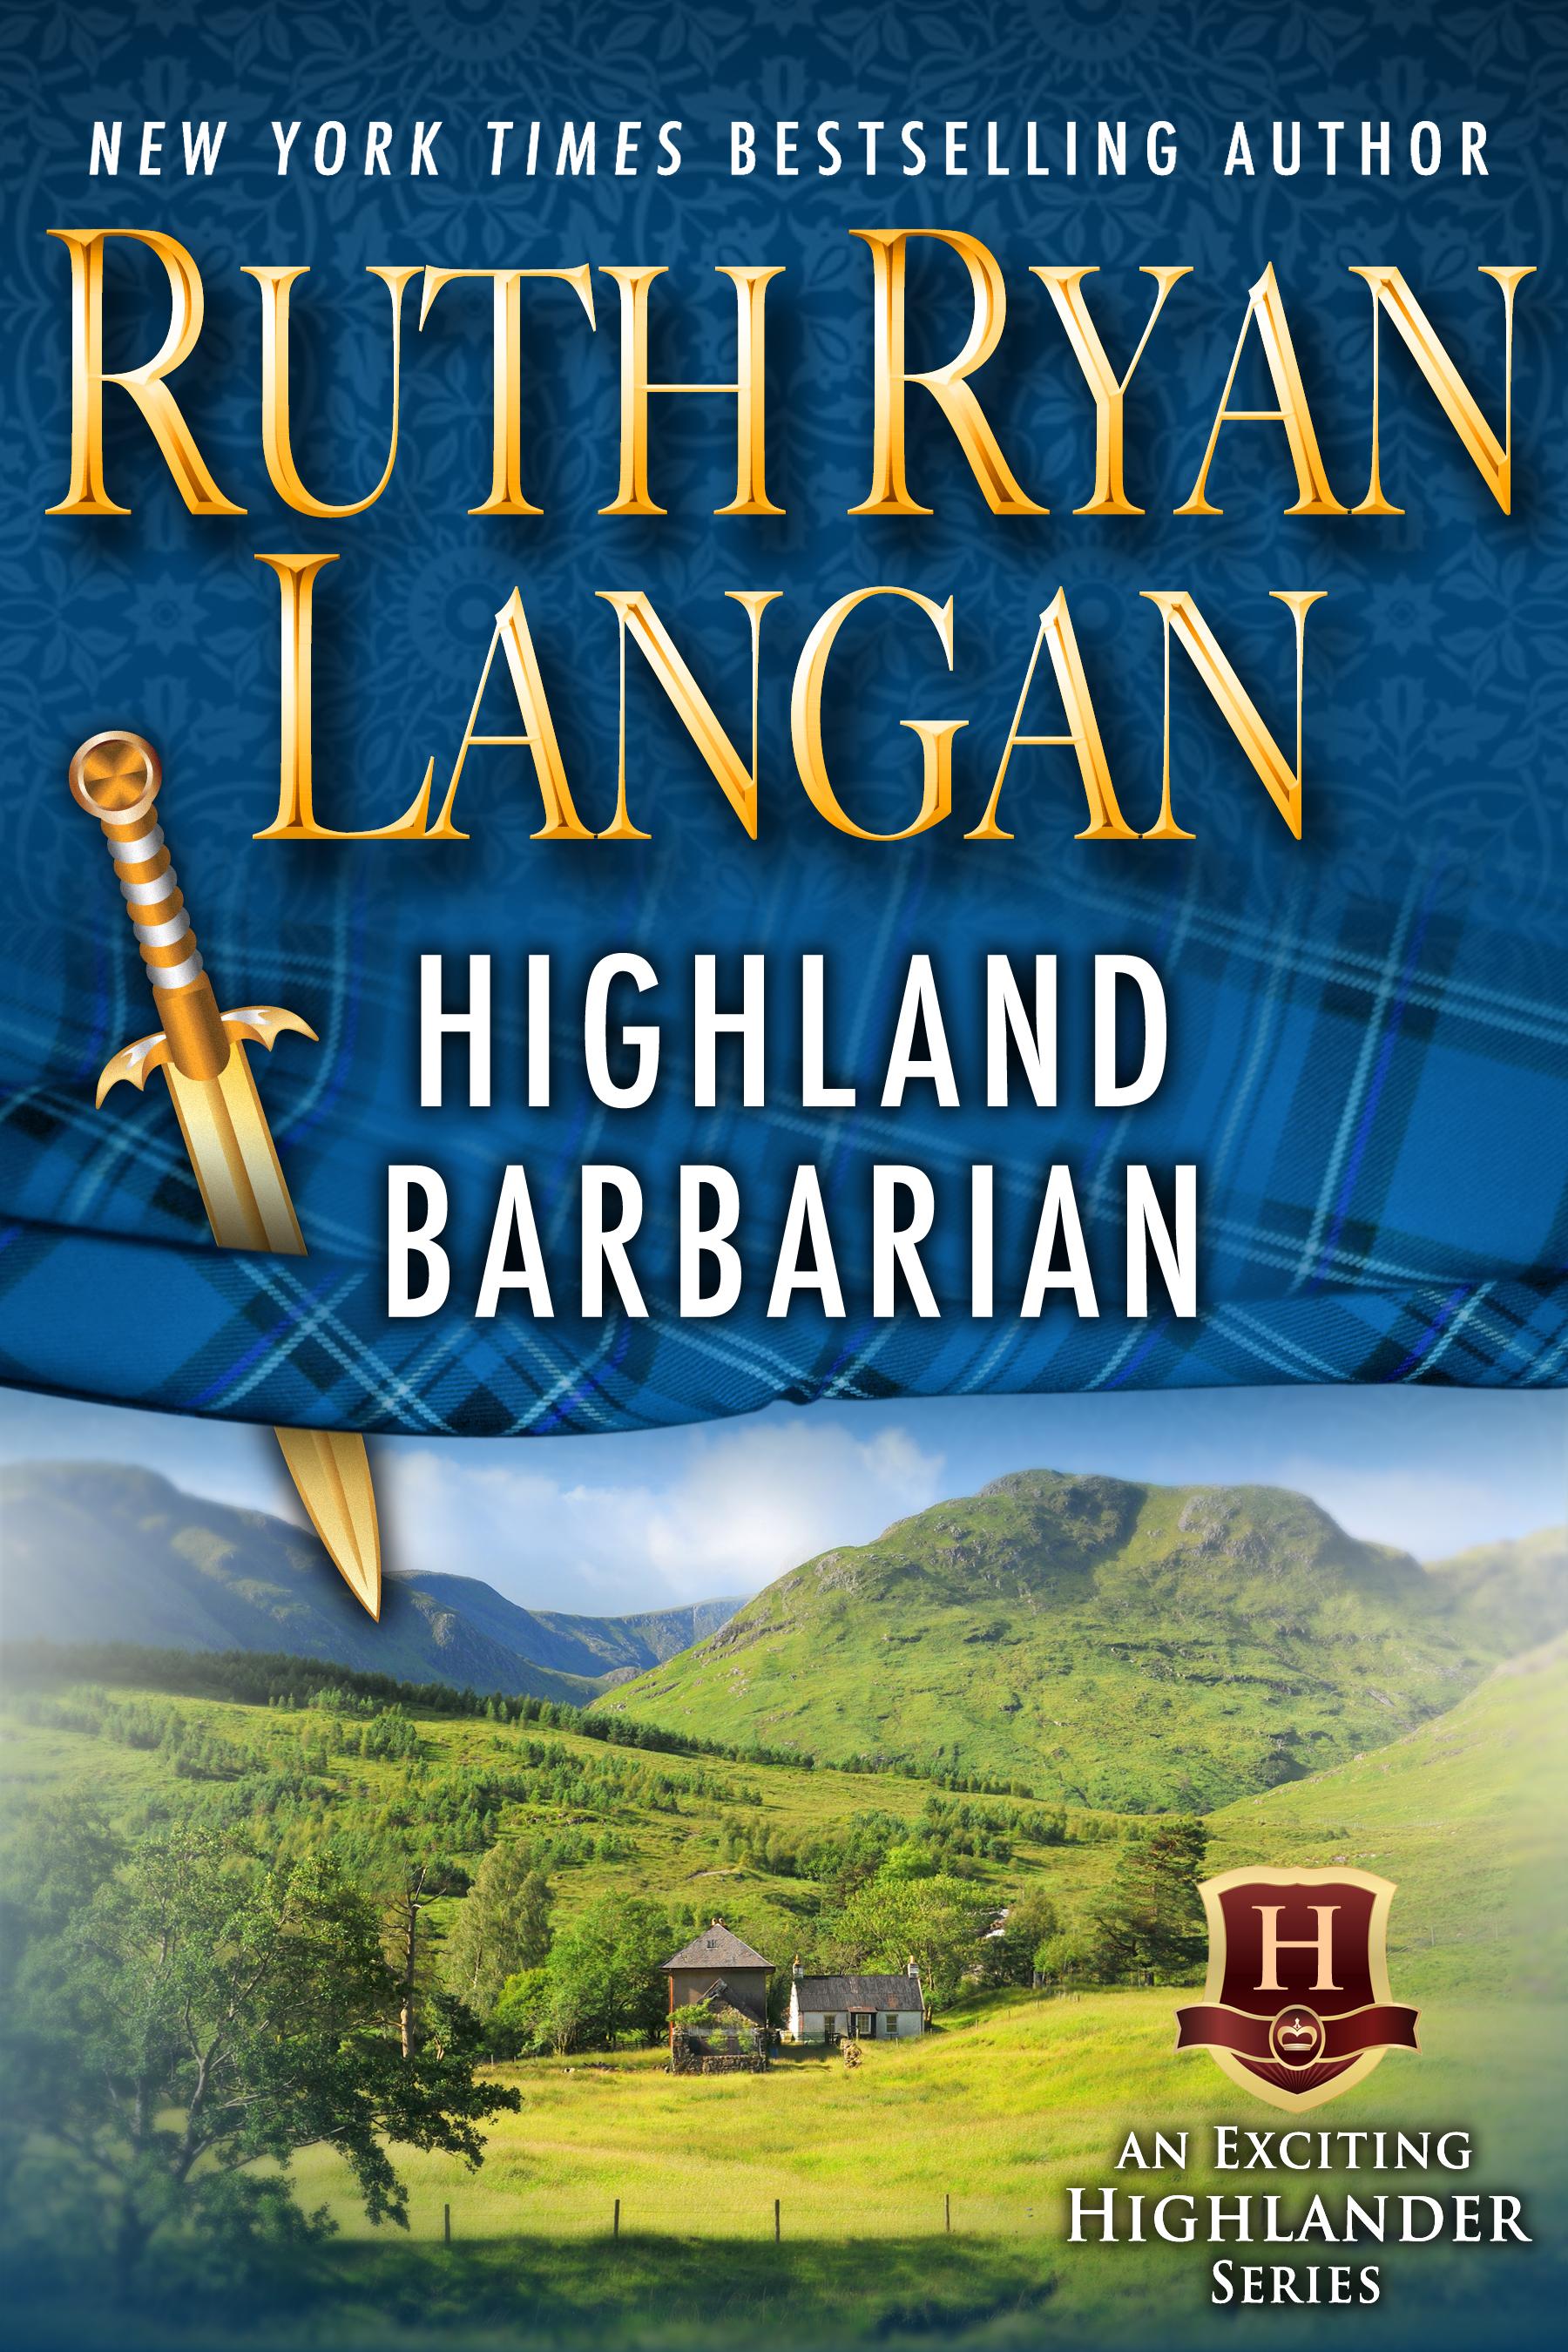 Highland Barbarian (sst-cccxxxvii)